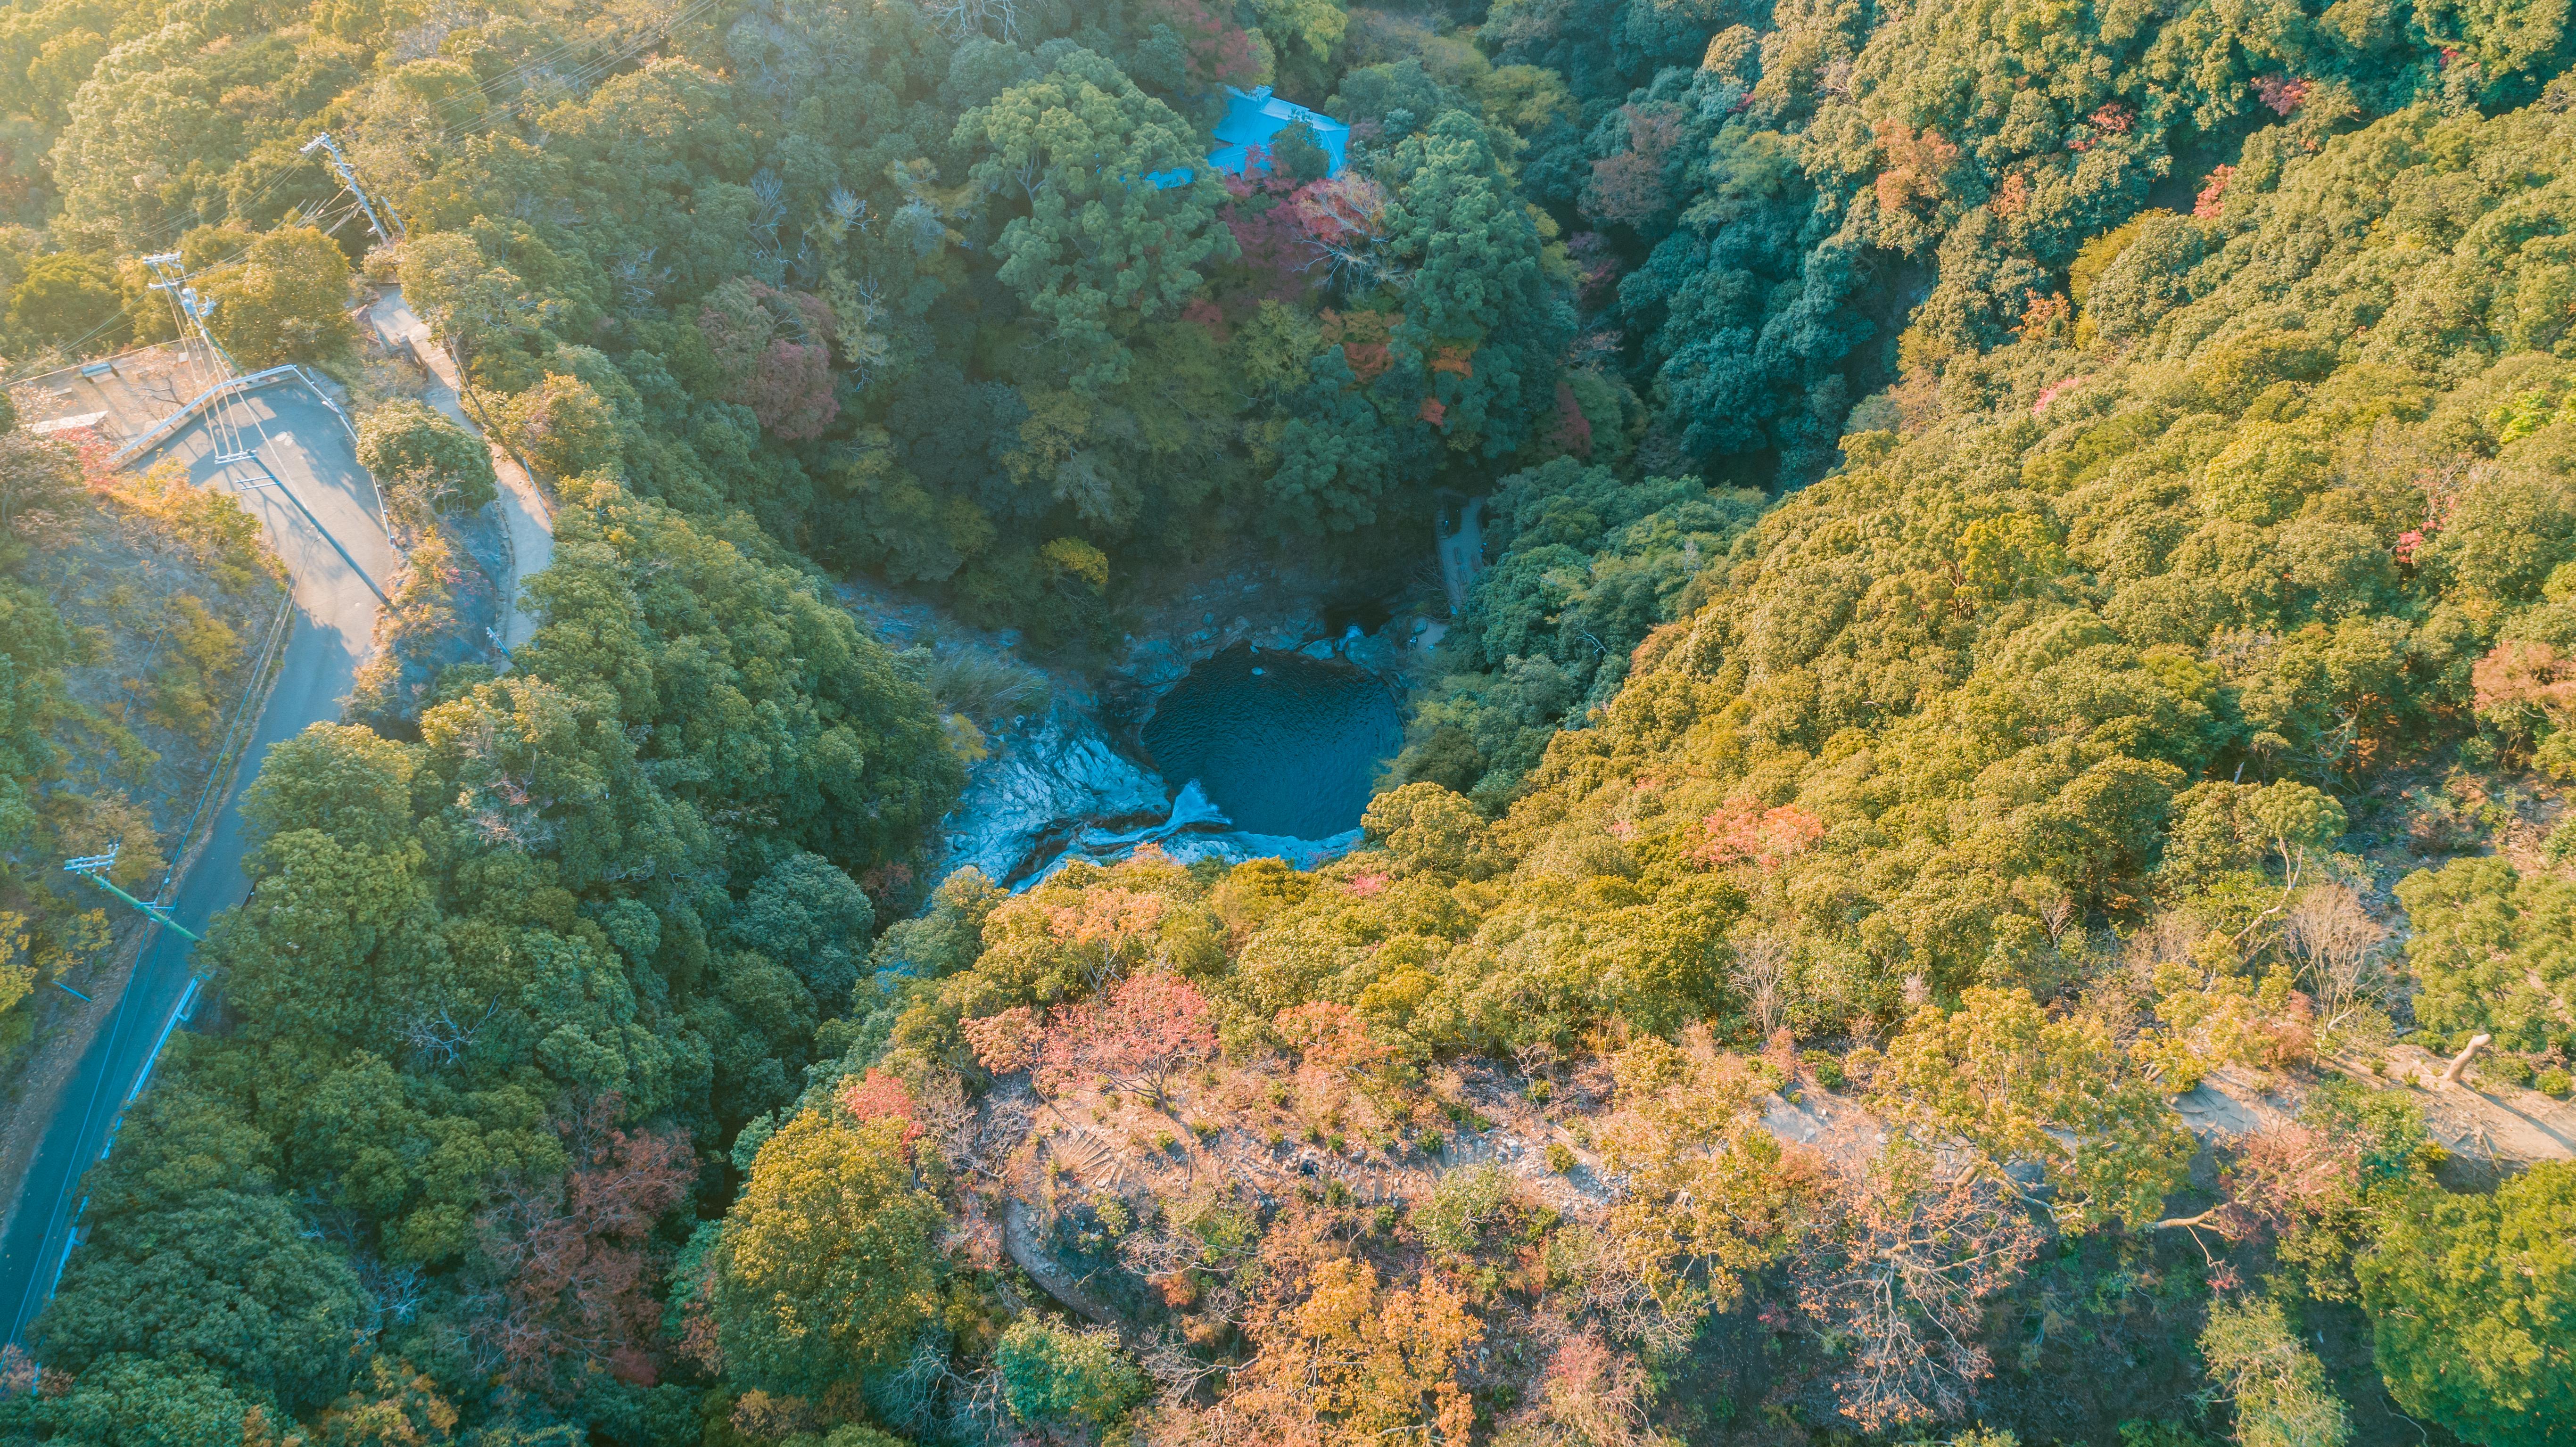 布引の滝 神戸 新神戸駅 新神戸 滝 日本の滝百選 登山 山登り